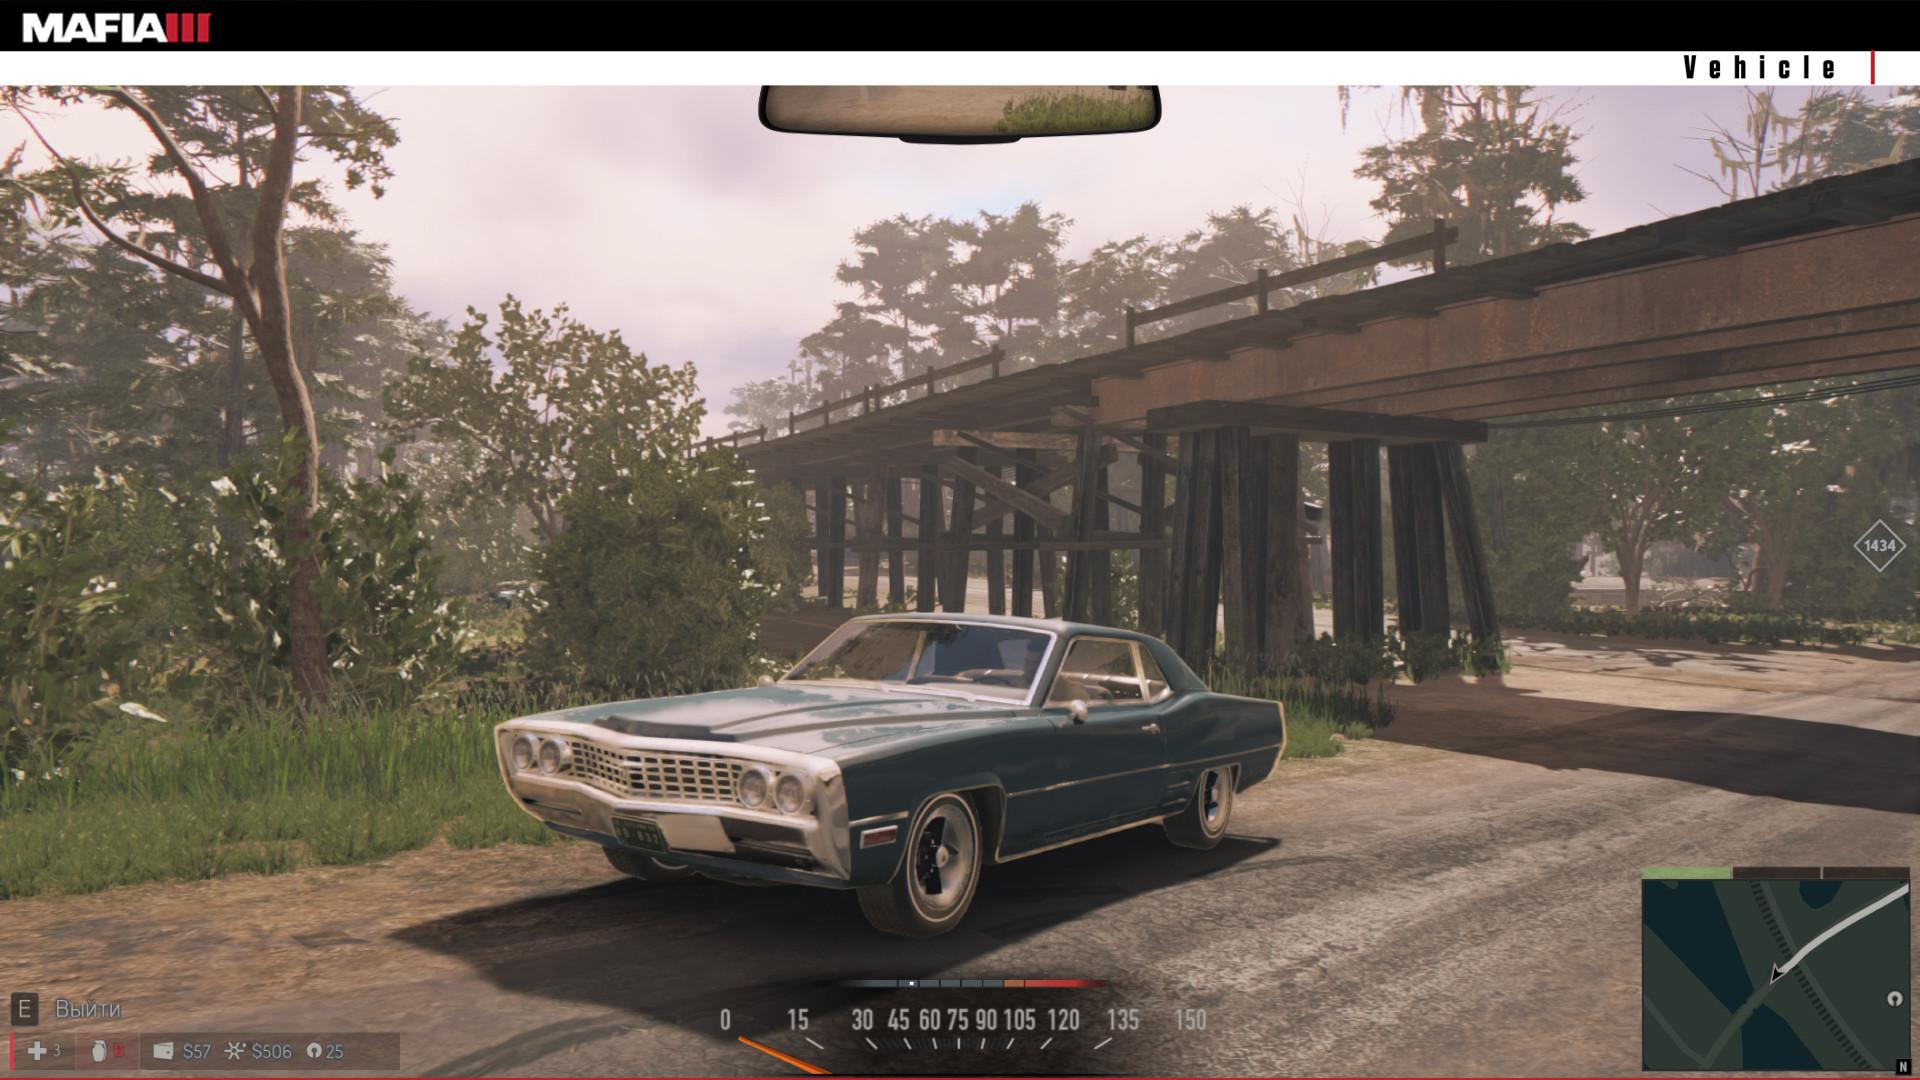 Artstation Muscle Car Vehicle For Mafia 3 Game Scythgames Studio